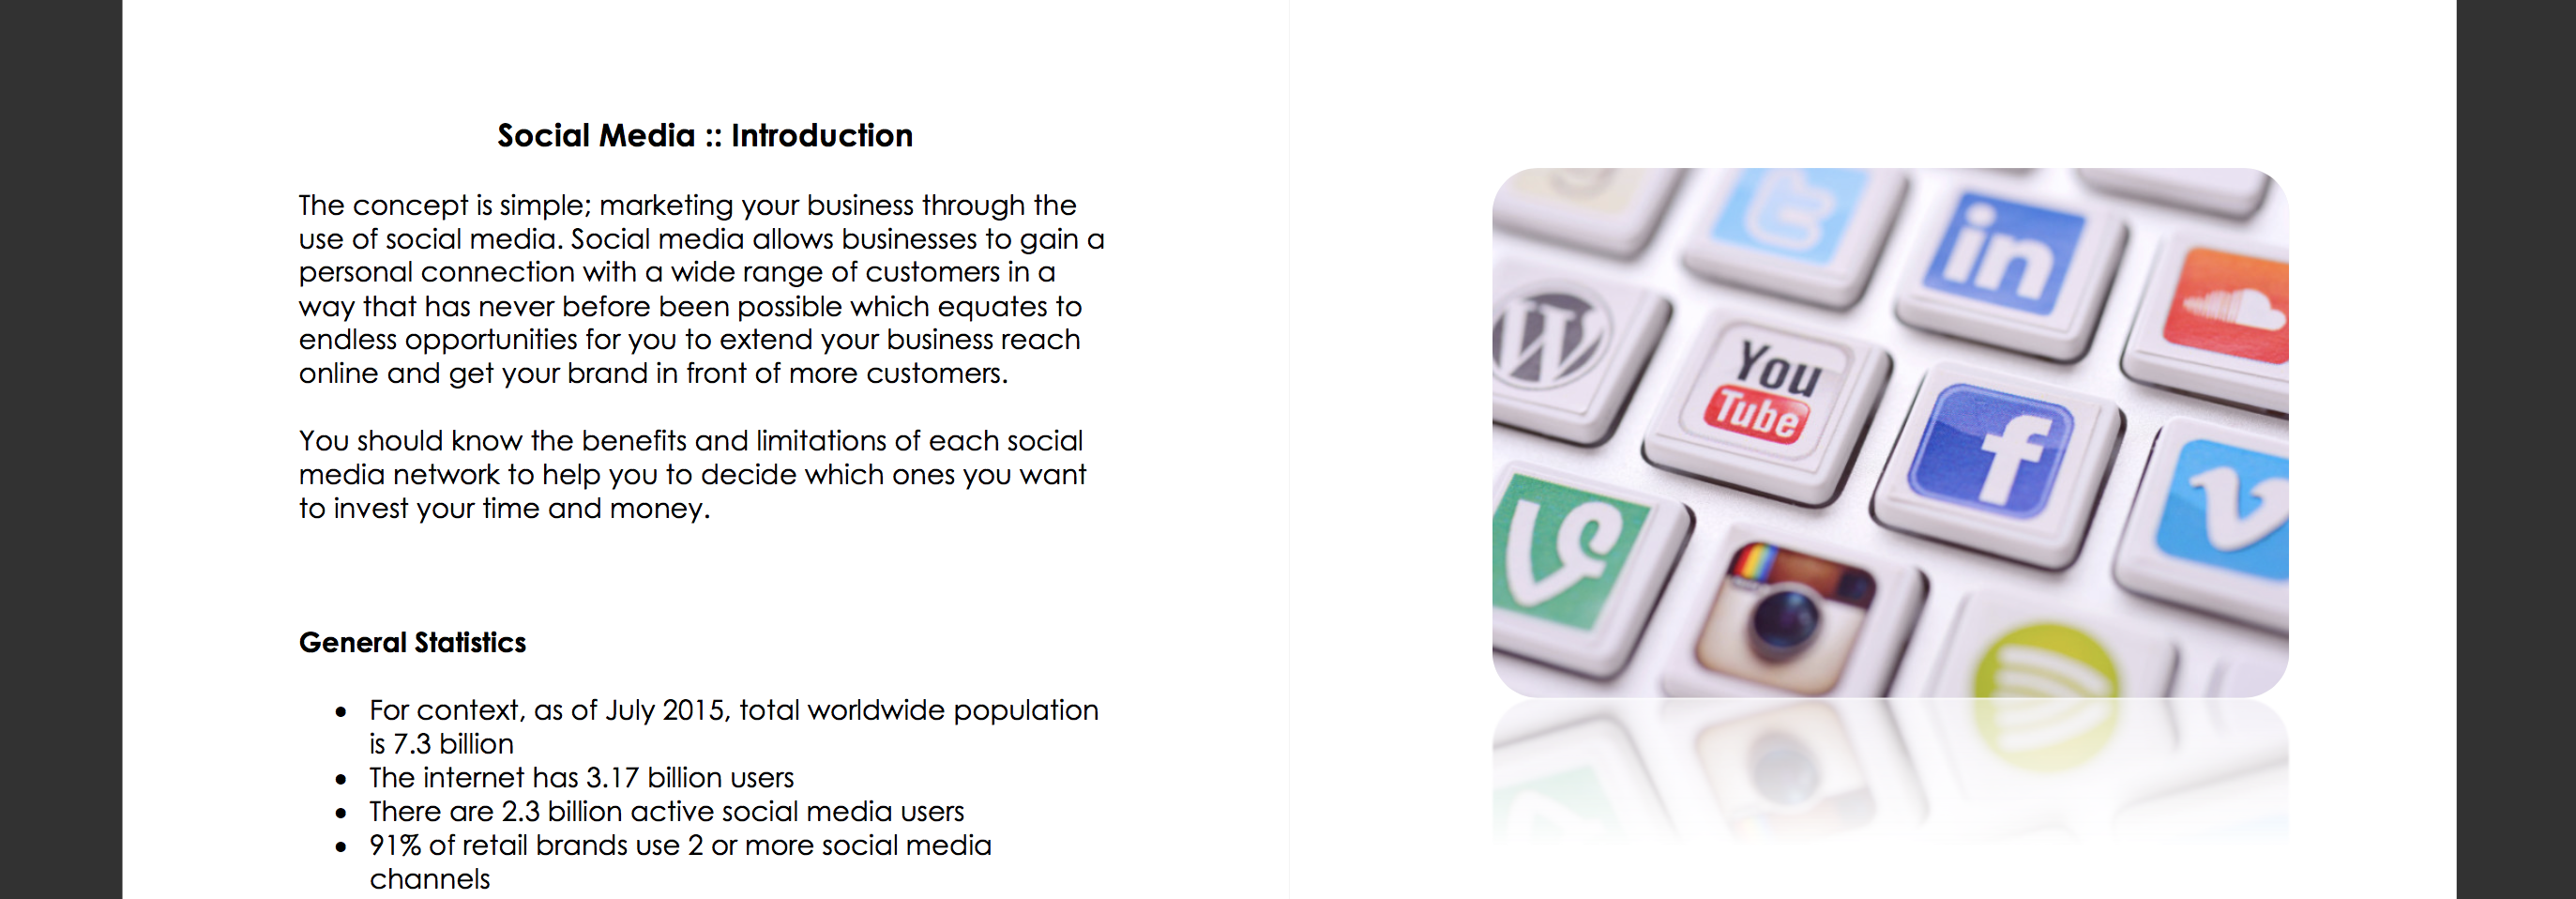 Social Media Essentials Gallery 1